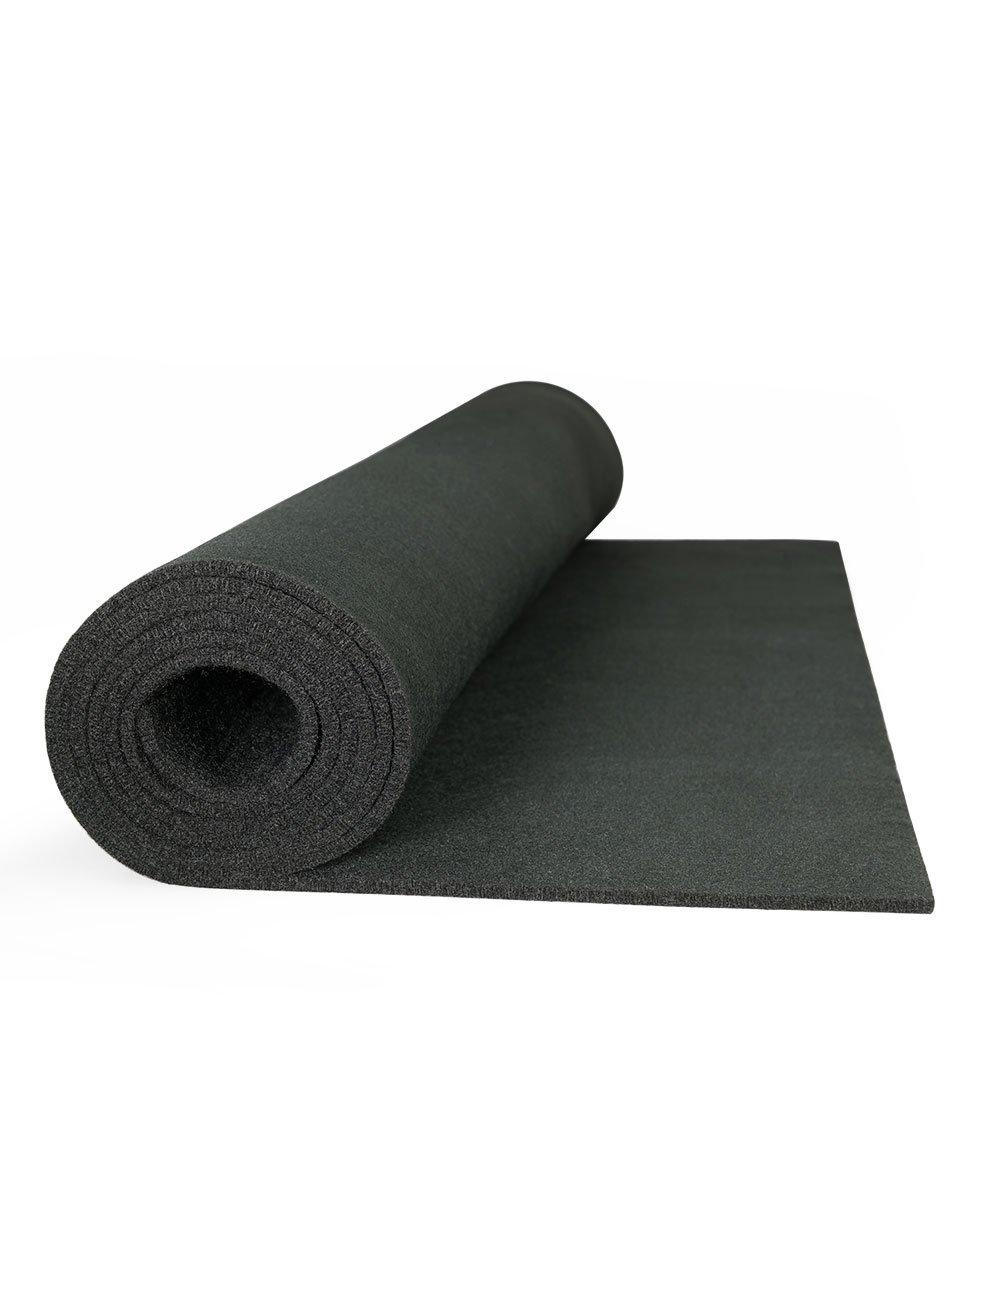 High Temp Felt Welding Blanket: 72'' Wide X 2 Yd Long, Black by The Felt Store